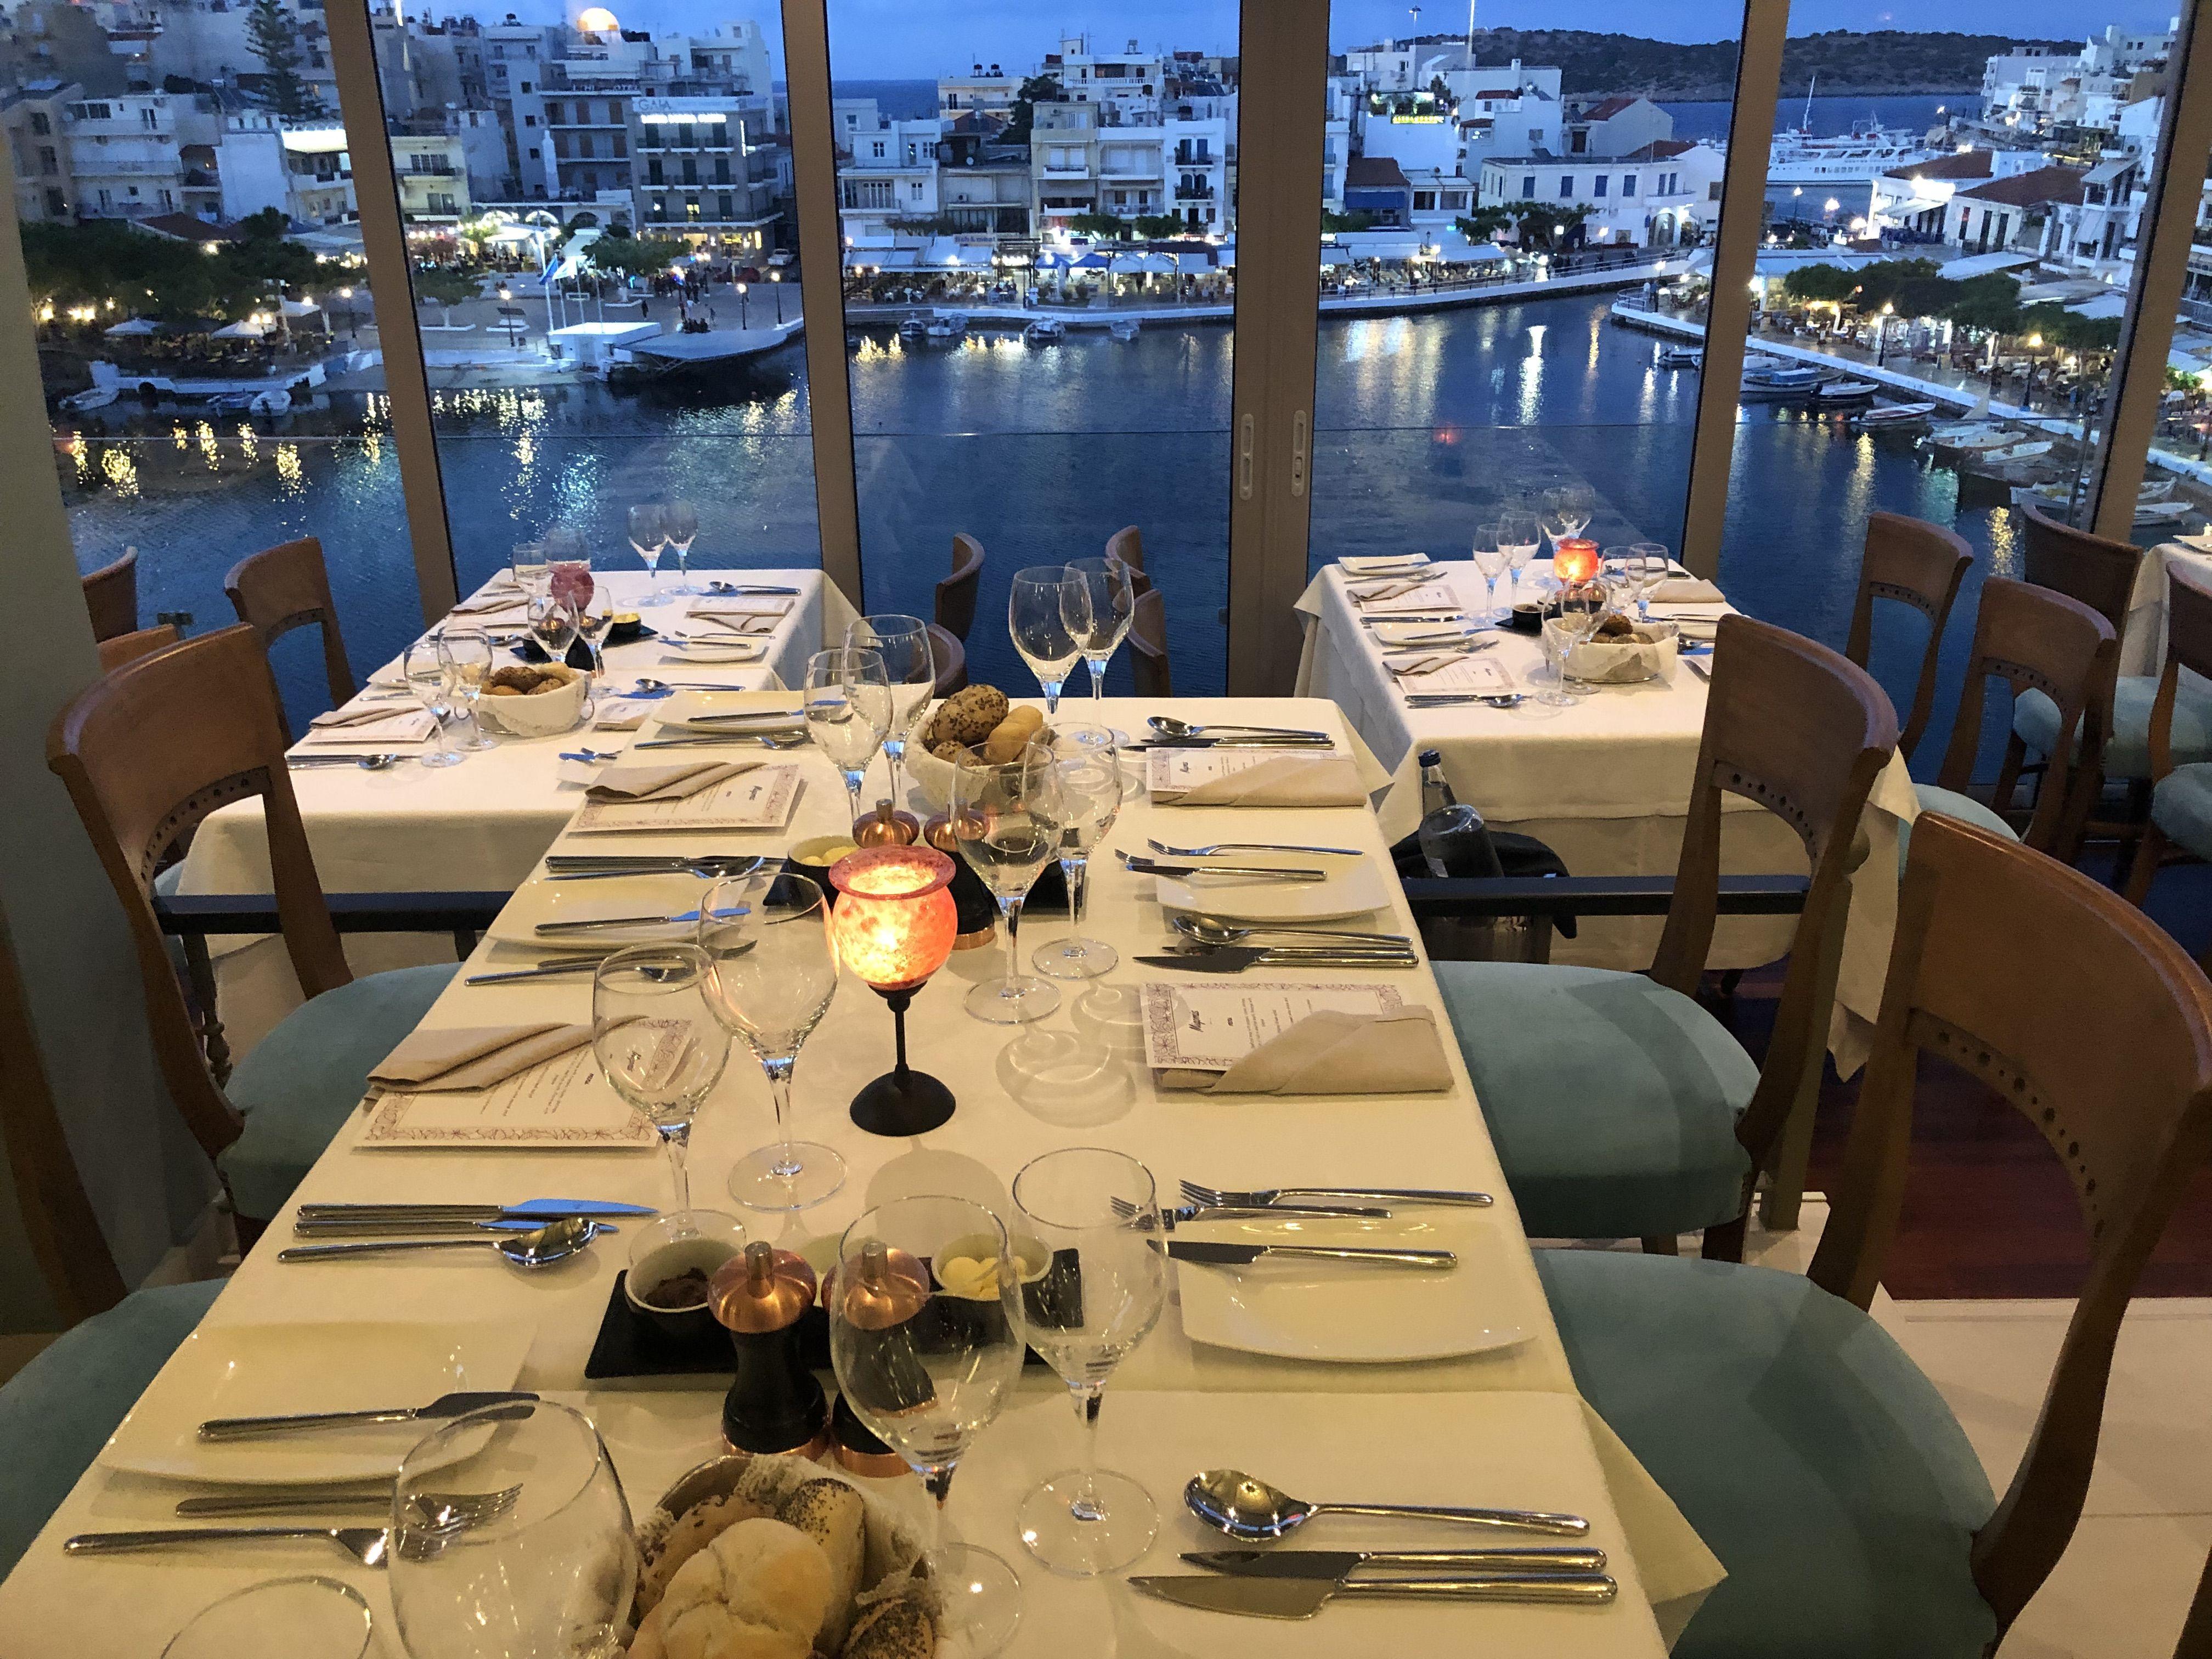 #Migomis #crete #greecetravel #greece #restaurants #dining #corporateevents